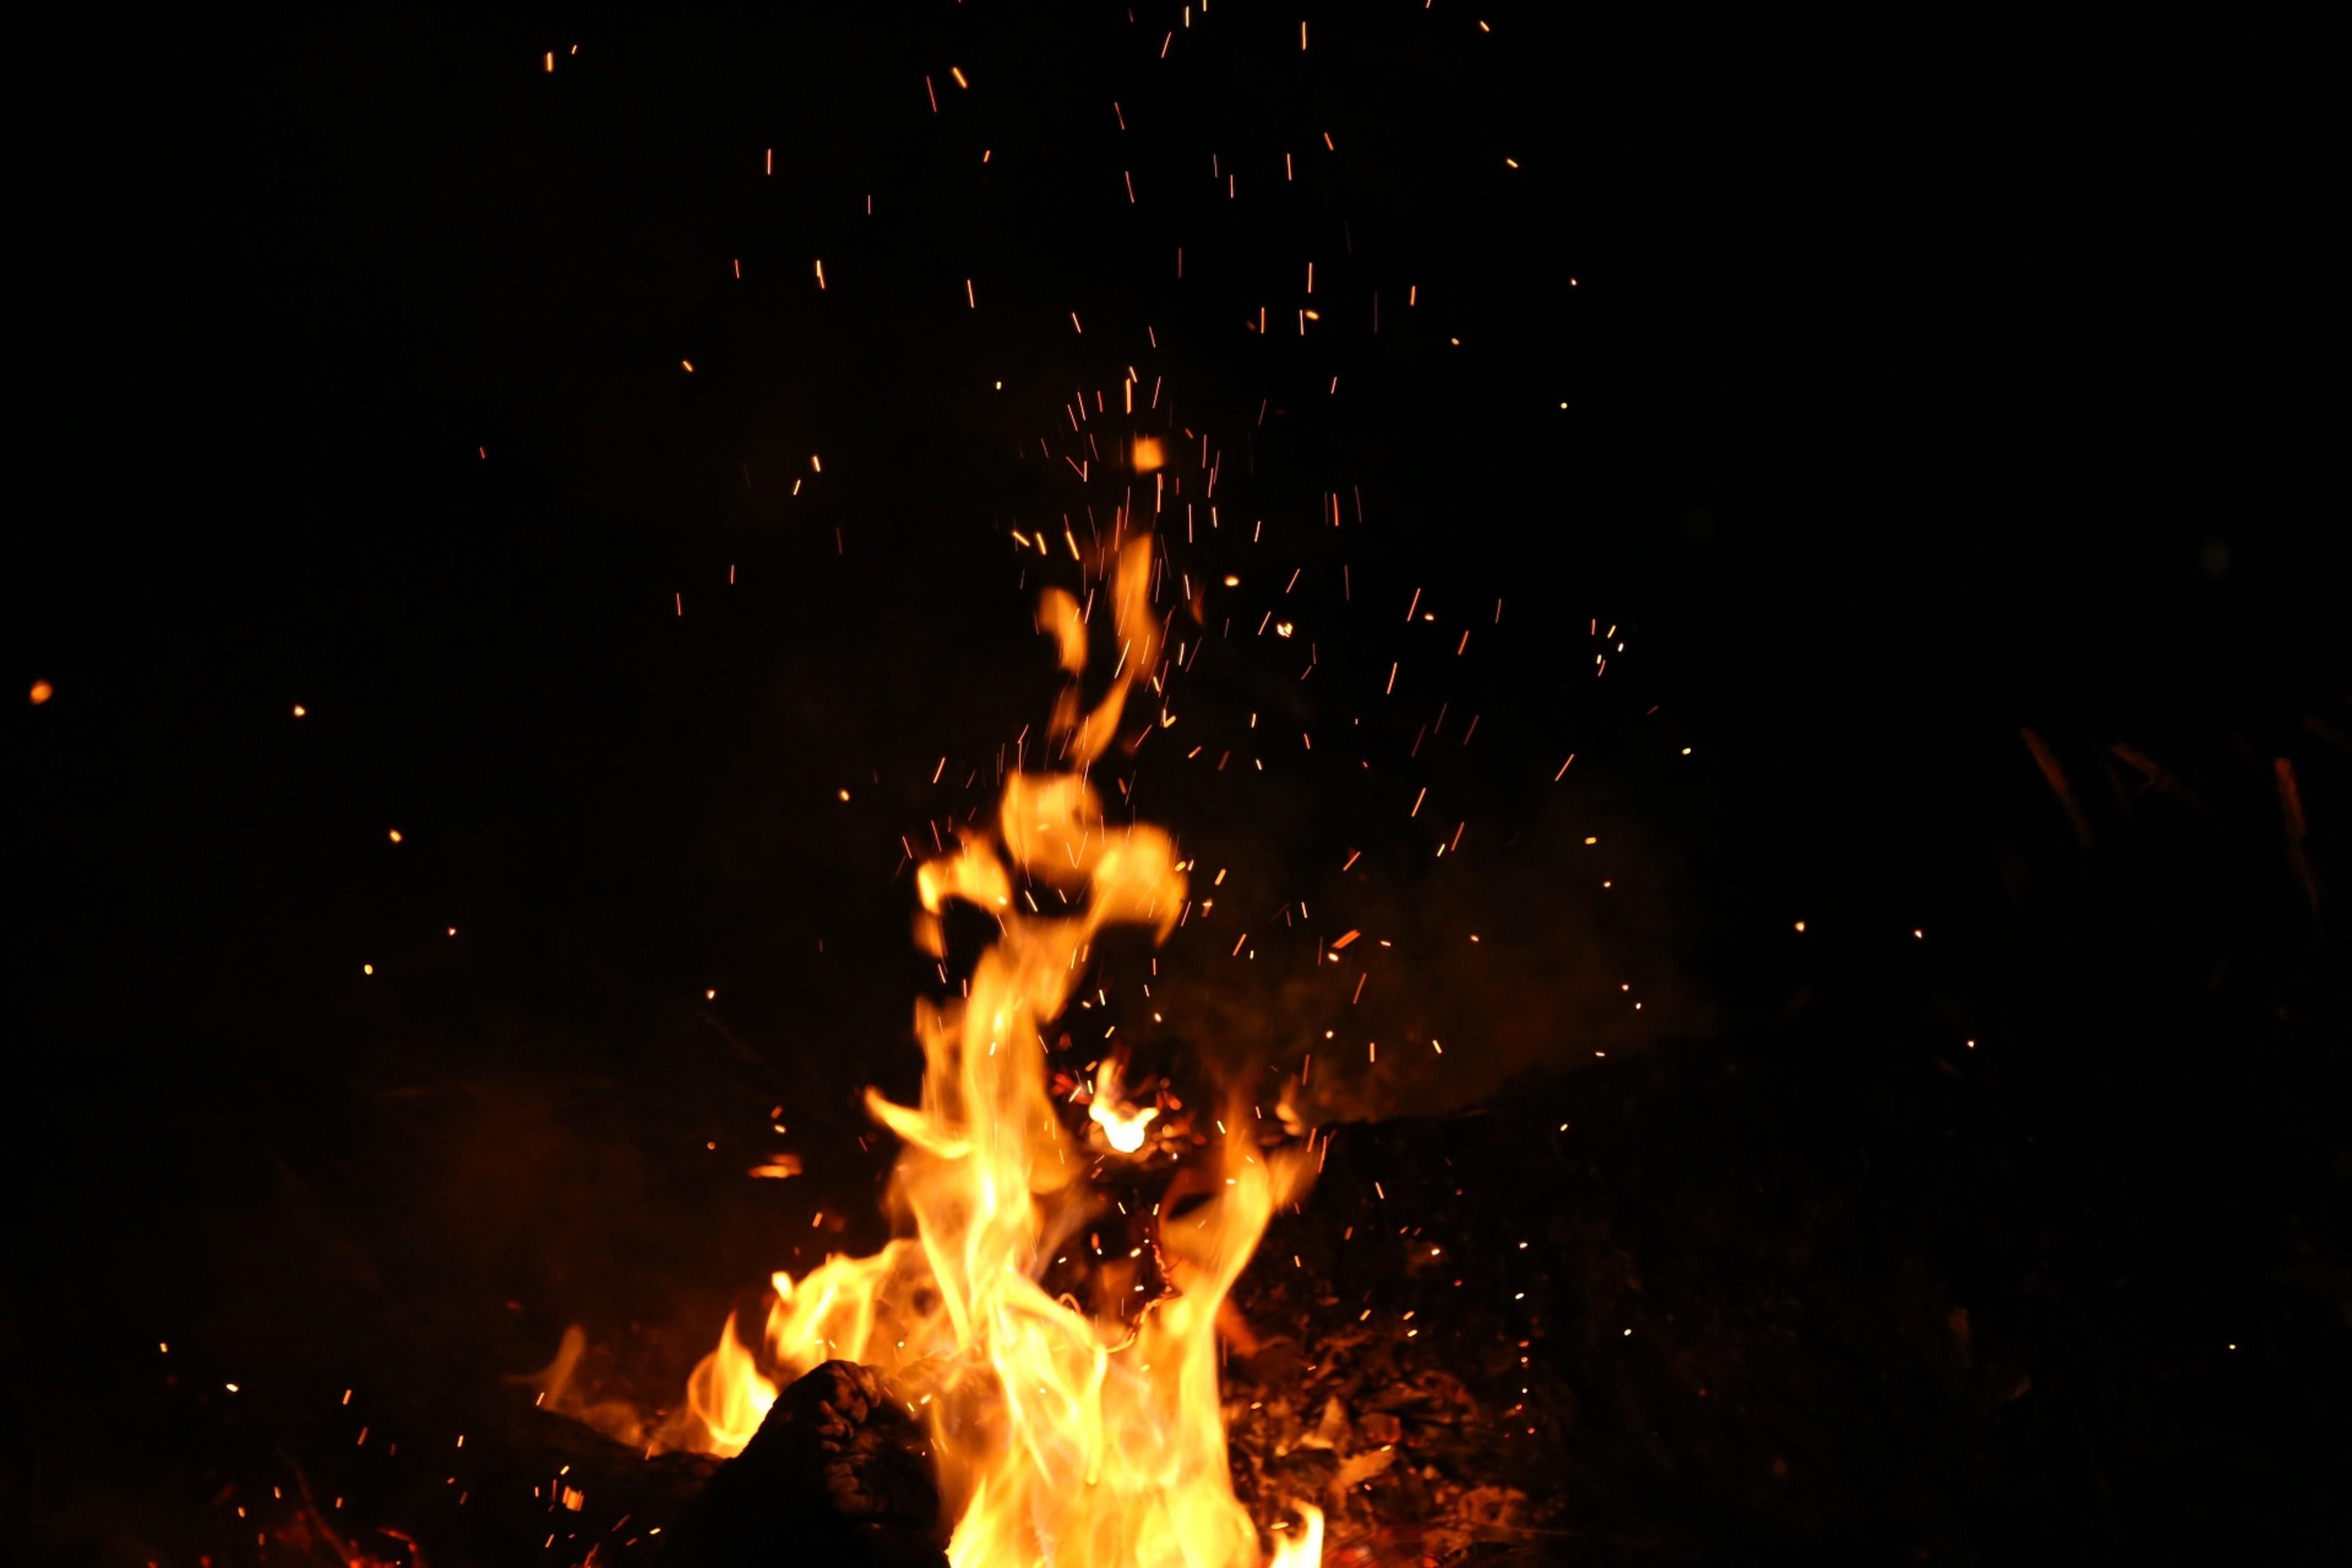 hintergrundbilder dunkel nacht feuer wunderkerze kamin lagerfeuer verbrennung event. Black Bedroom Furniture Sets. Home Design Ideas